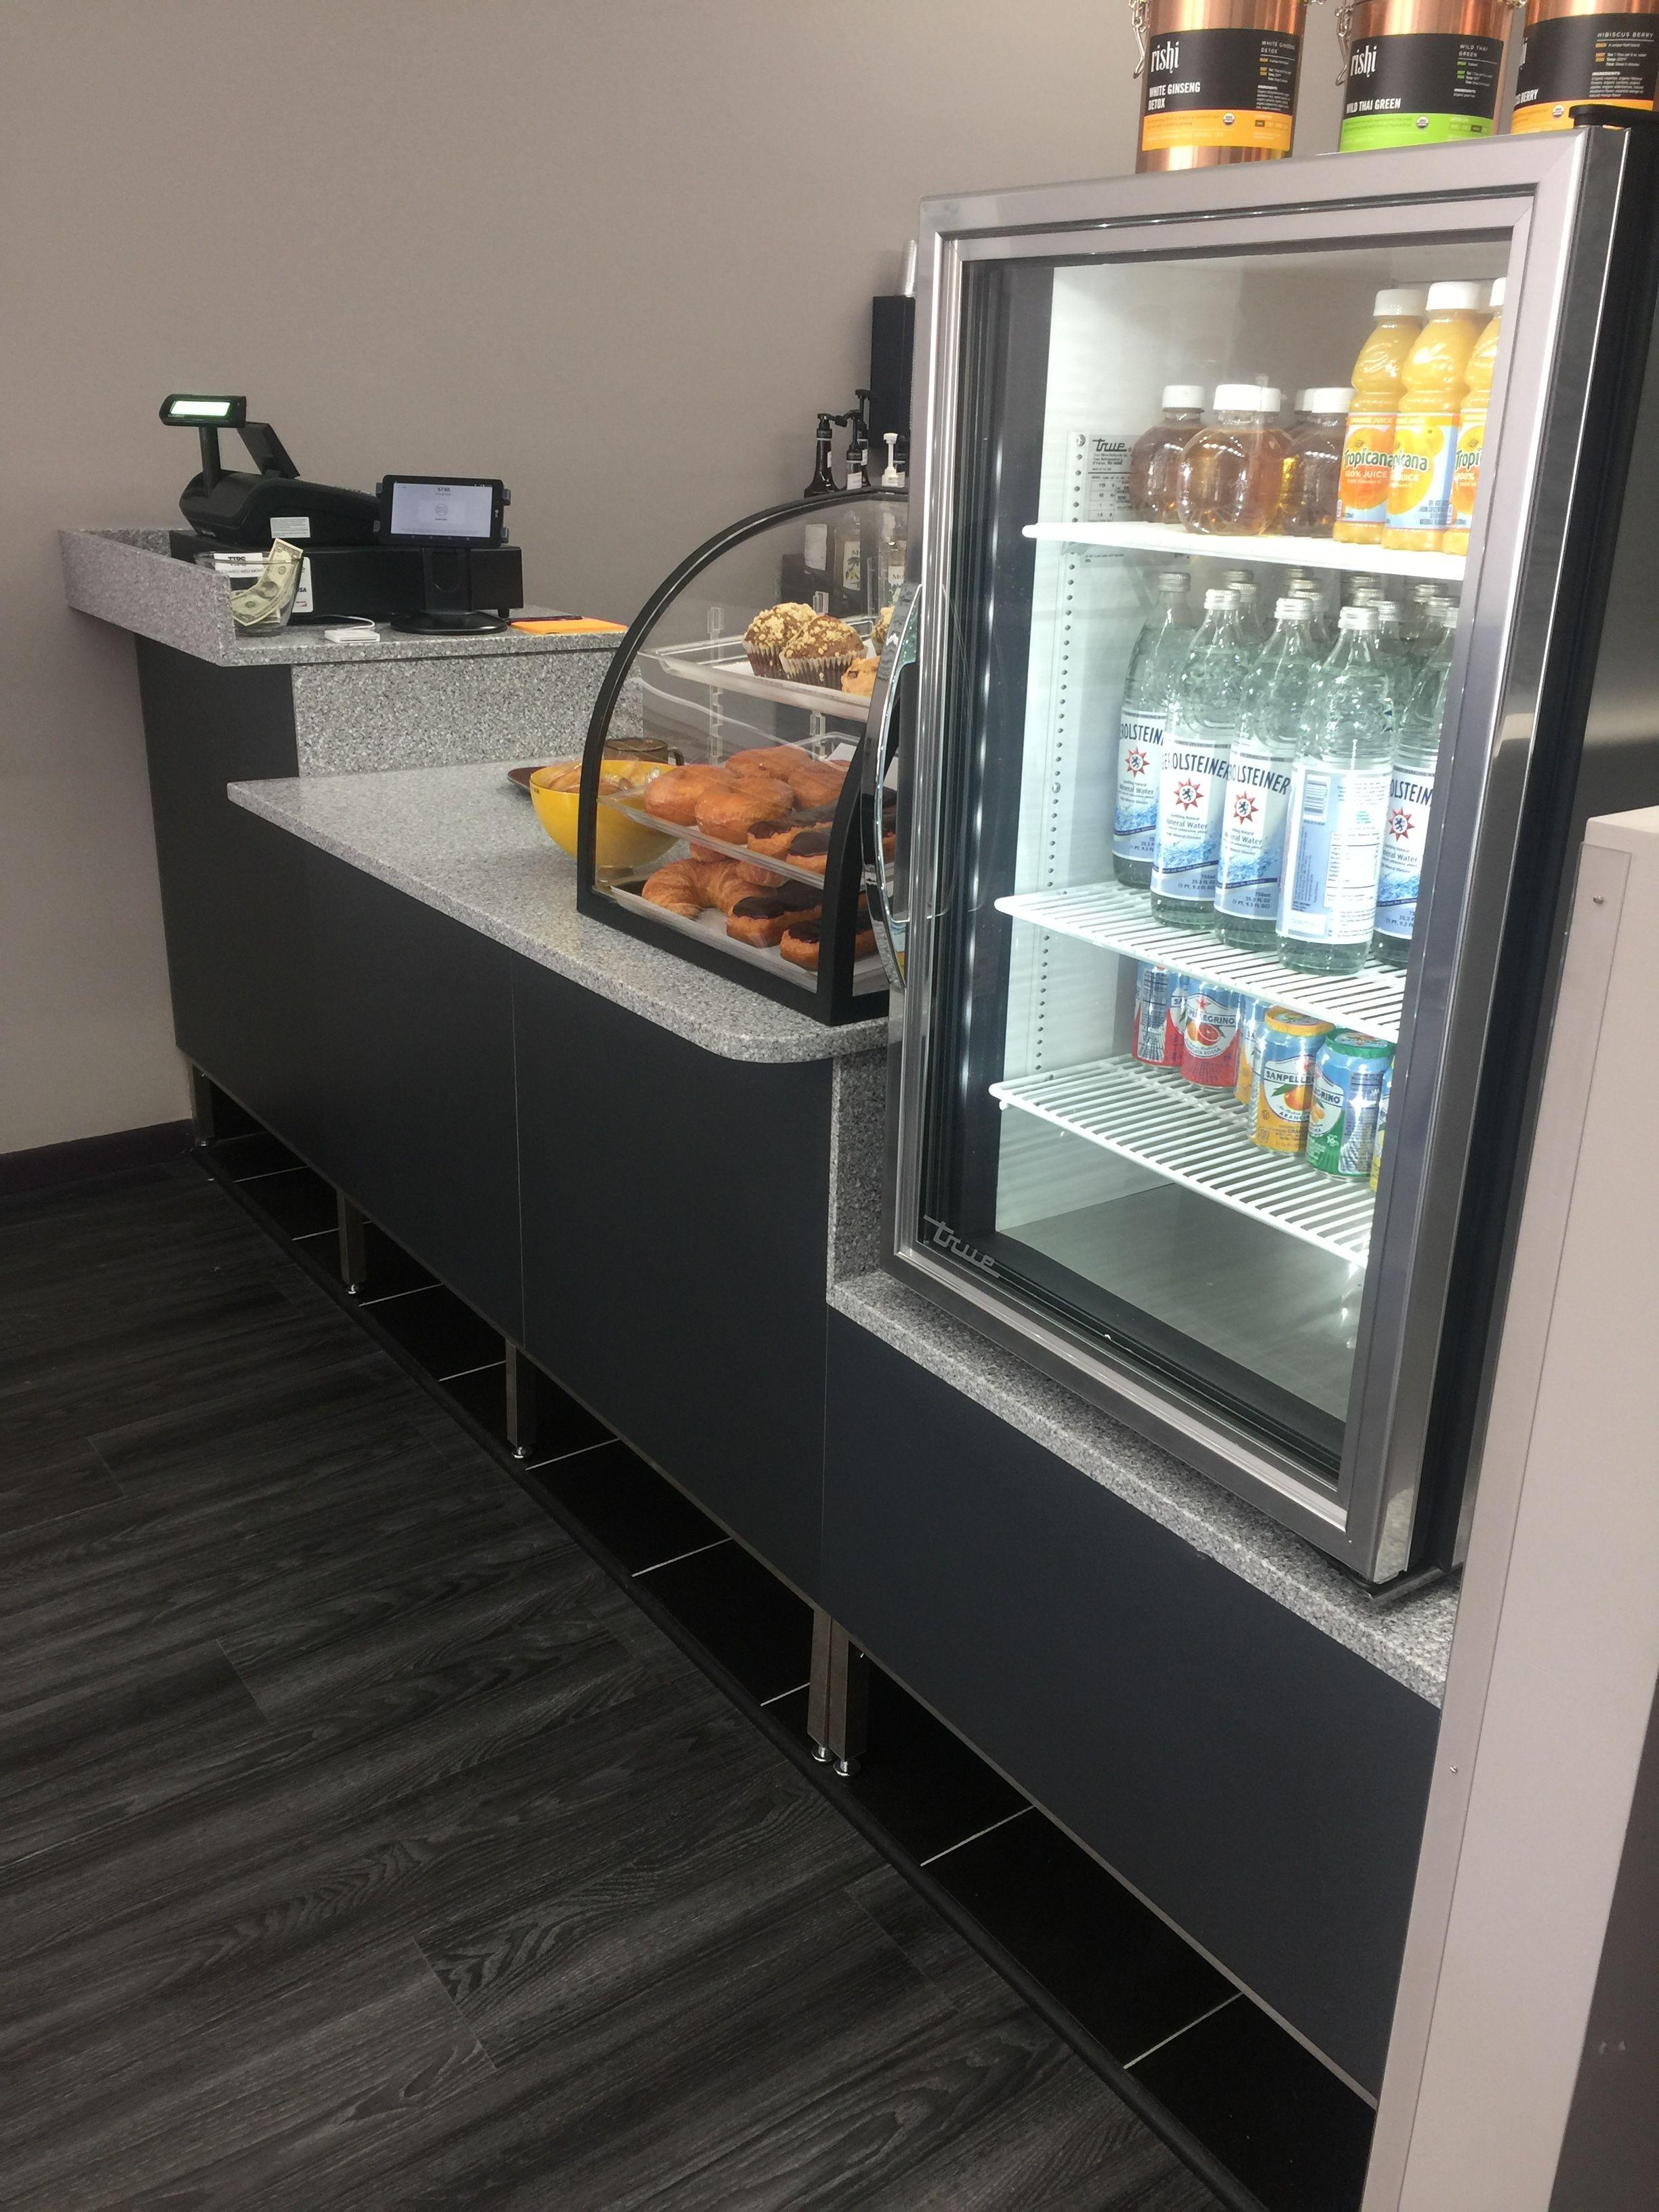 Coffee shop, Chicago 2017 | Kitchen appliances, Liquor cabinet, Coffee shop